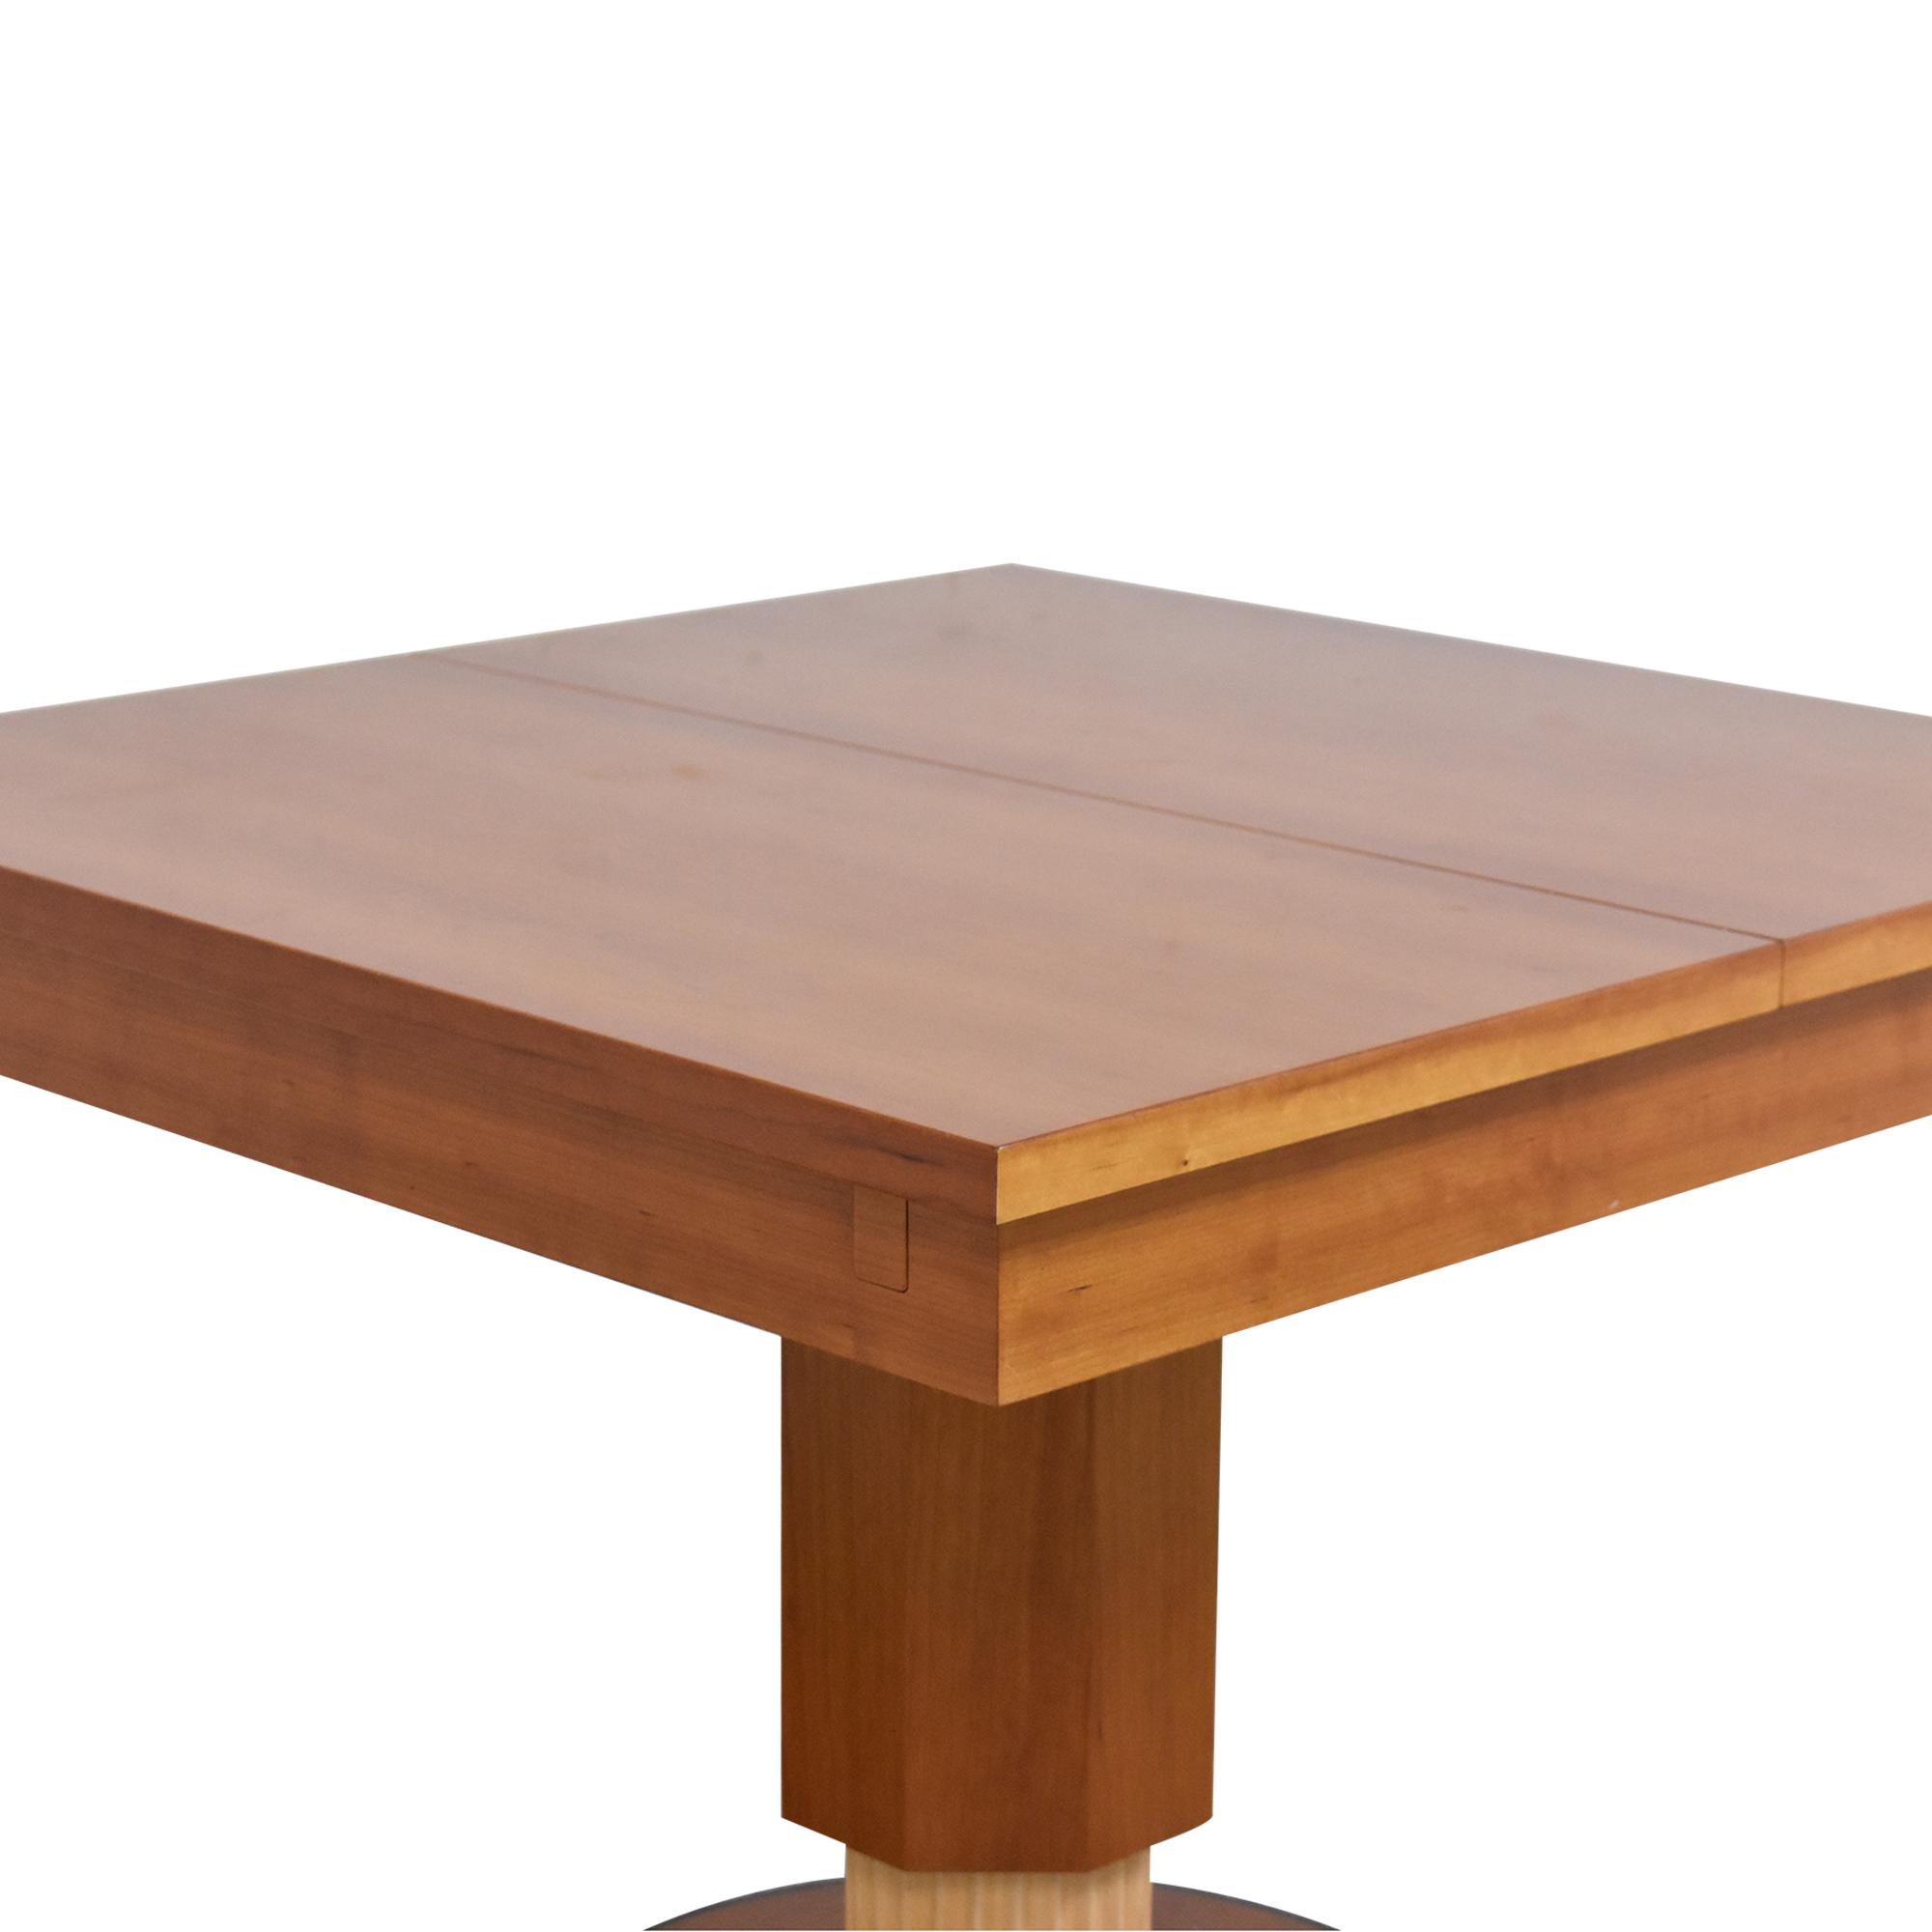 Giorgetti Giorgetti Square Extendable Dining Table ct